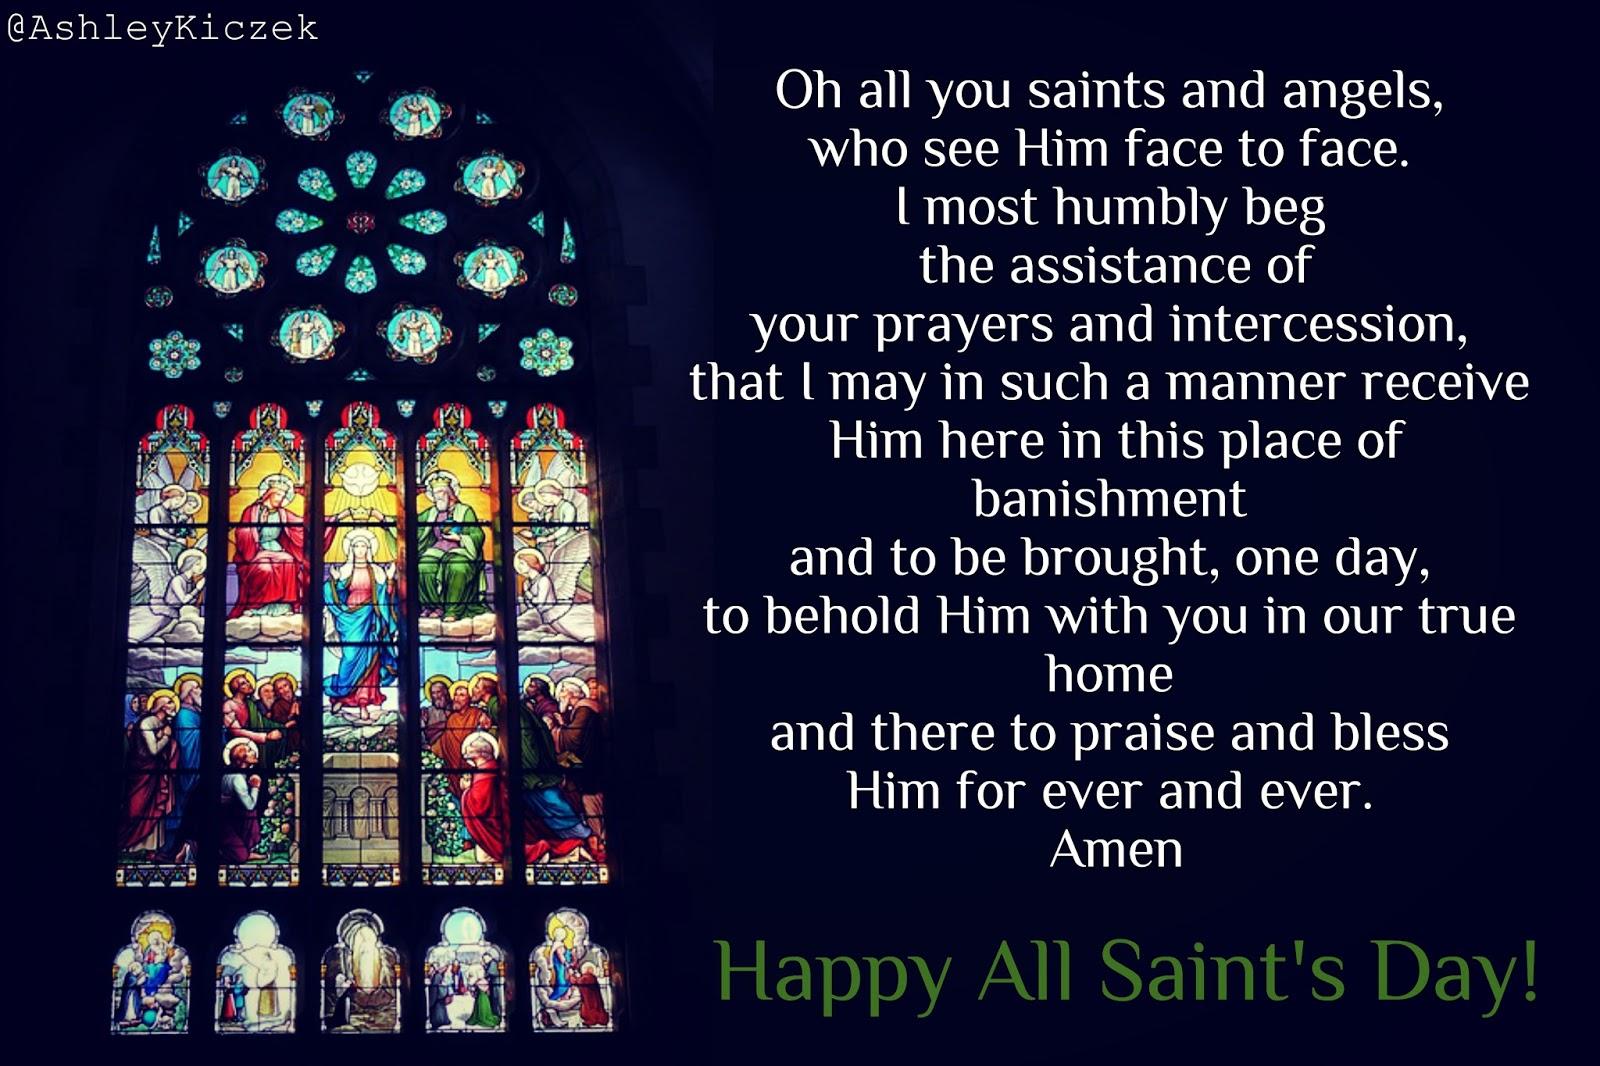 All Saints Day Prayer